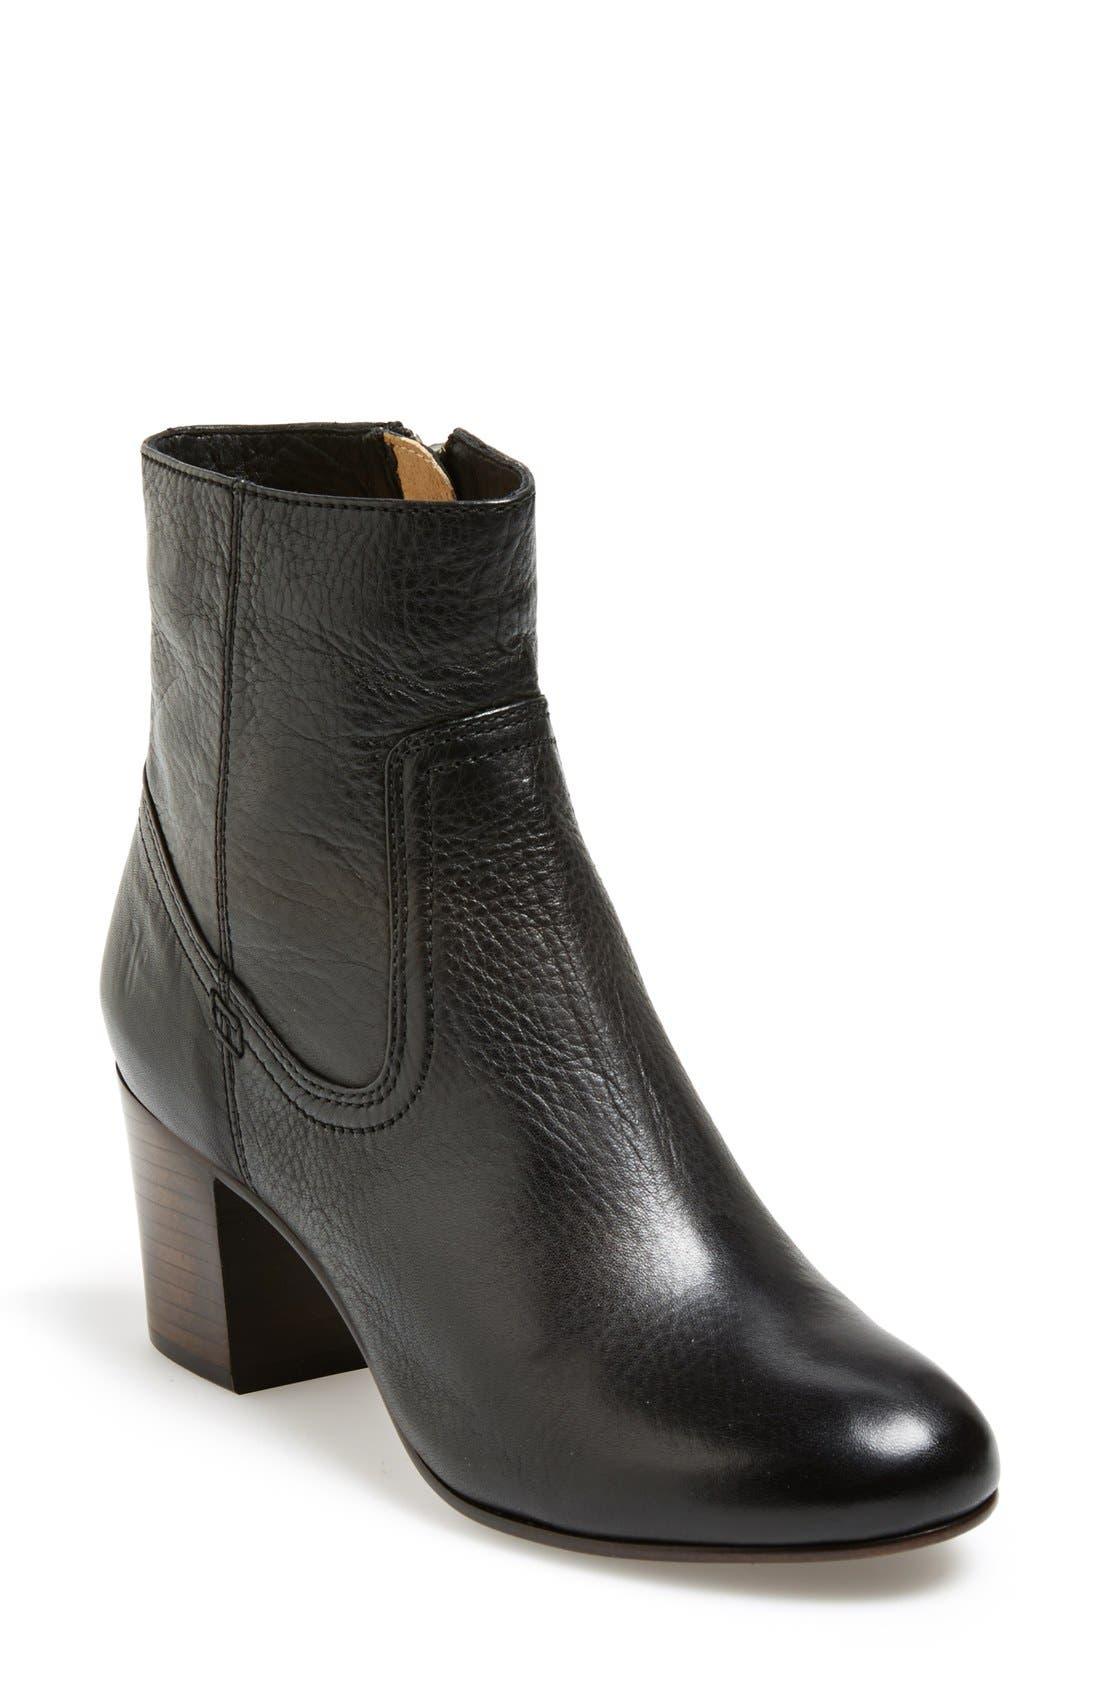 Alternate Image 1 Selected - Frye 'Stella' Zip Short Boot (Women)